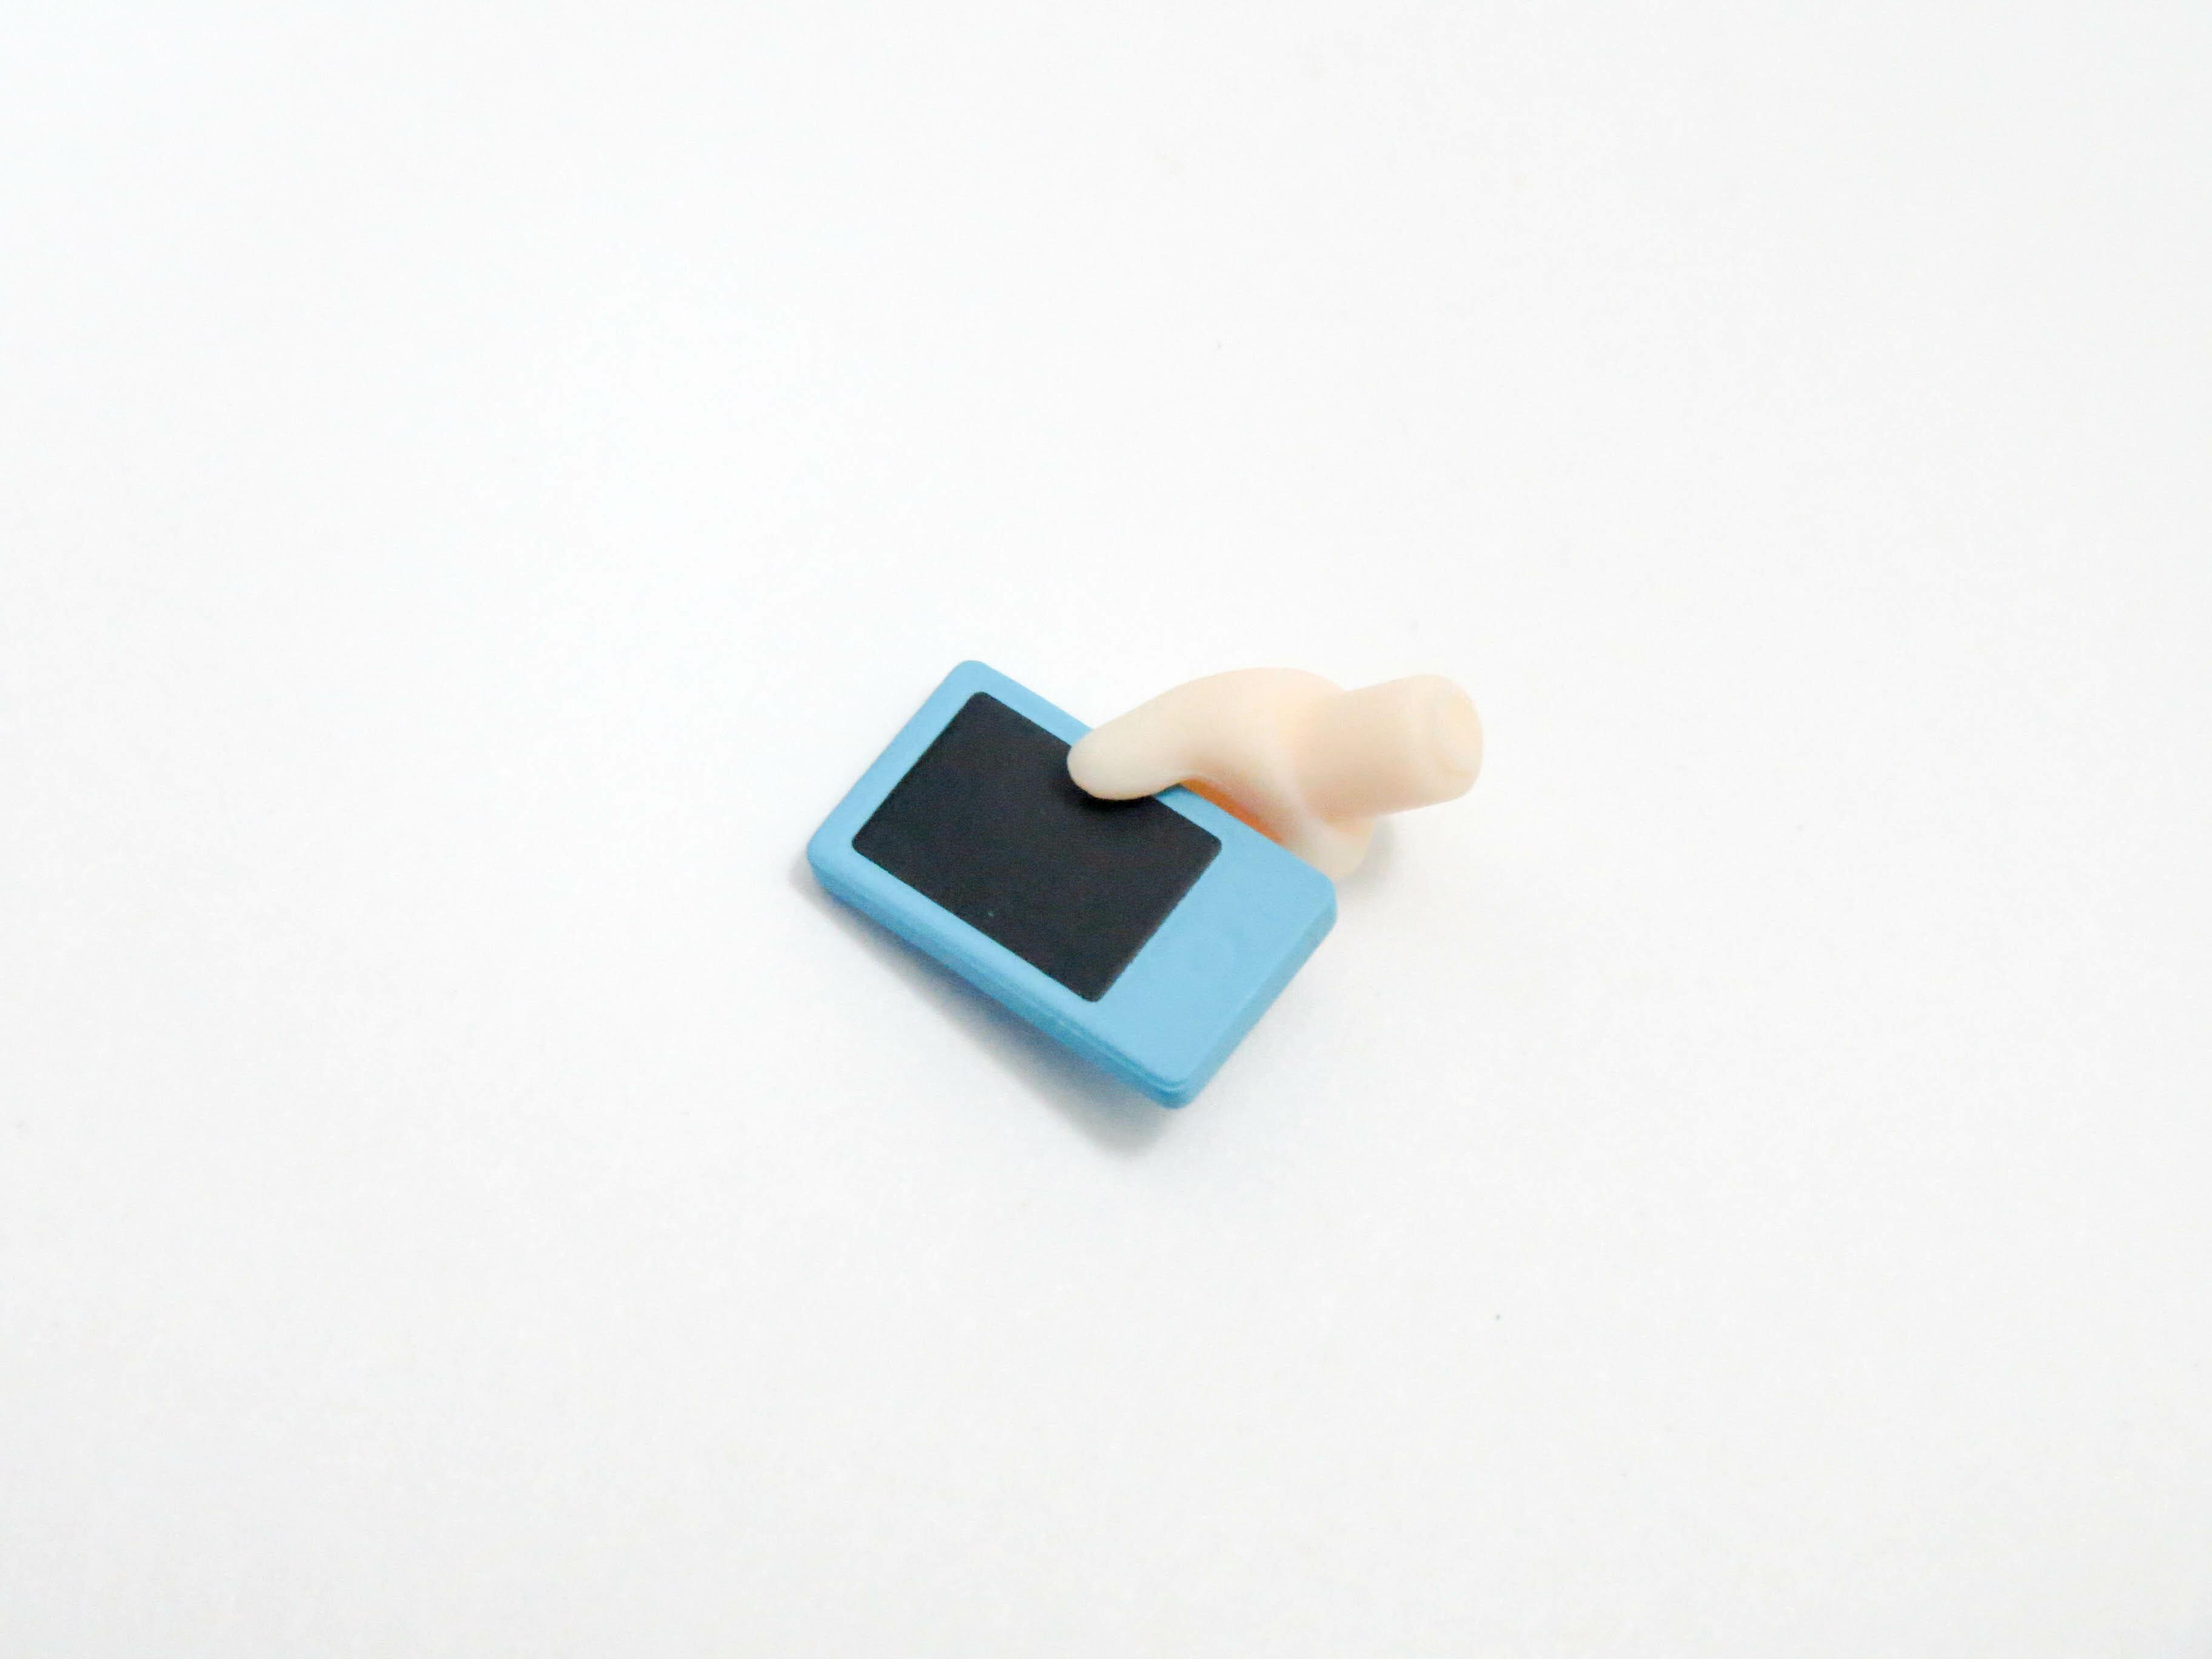 【981DX】 志摩リン DX Ver. 小物パーツ 携帯電話 ねんどろいど